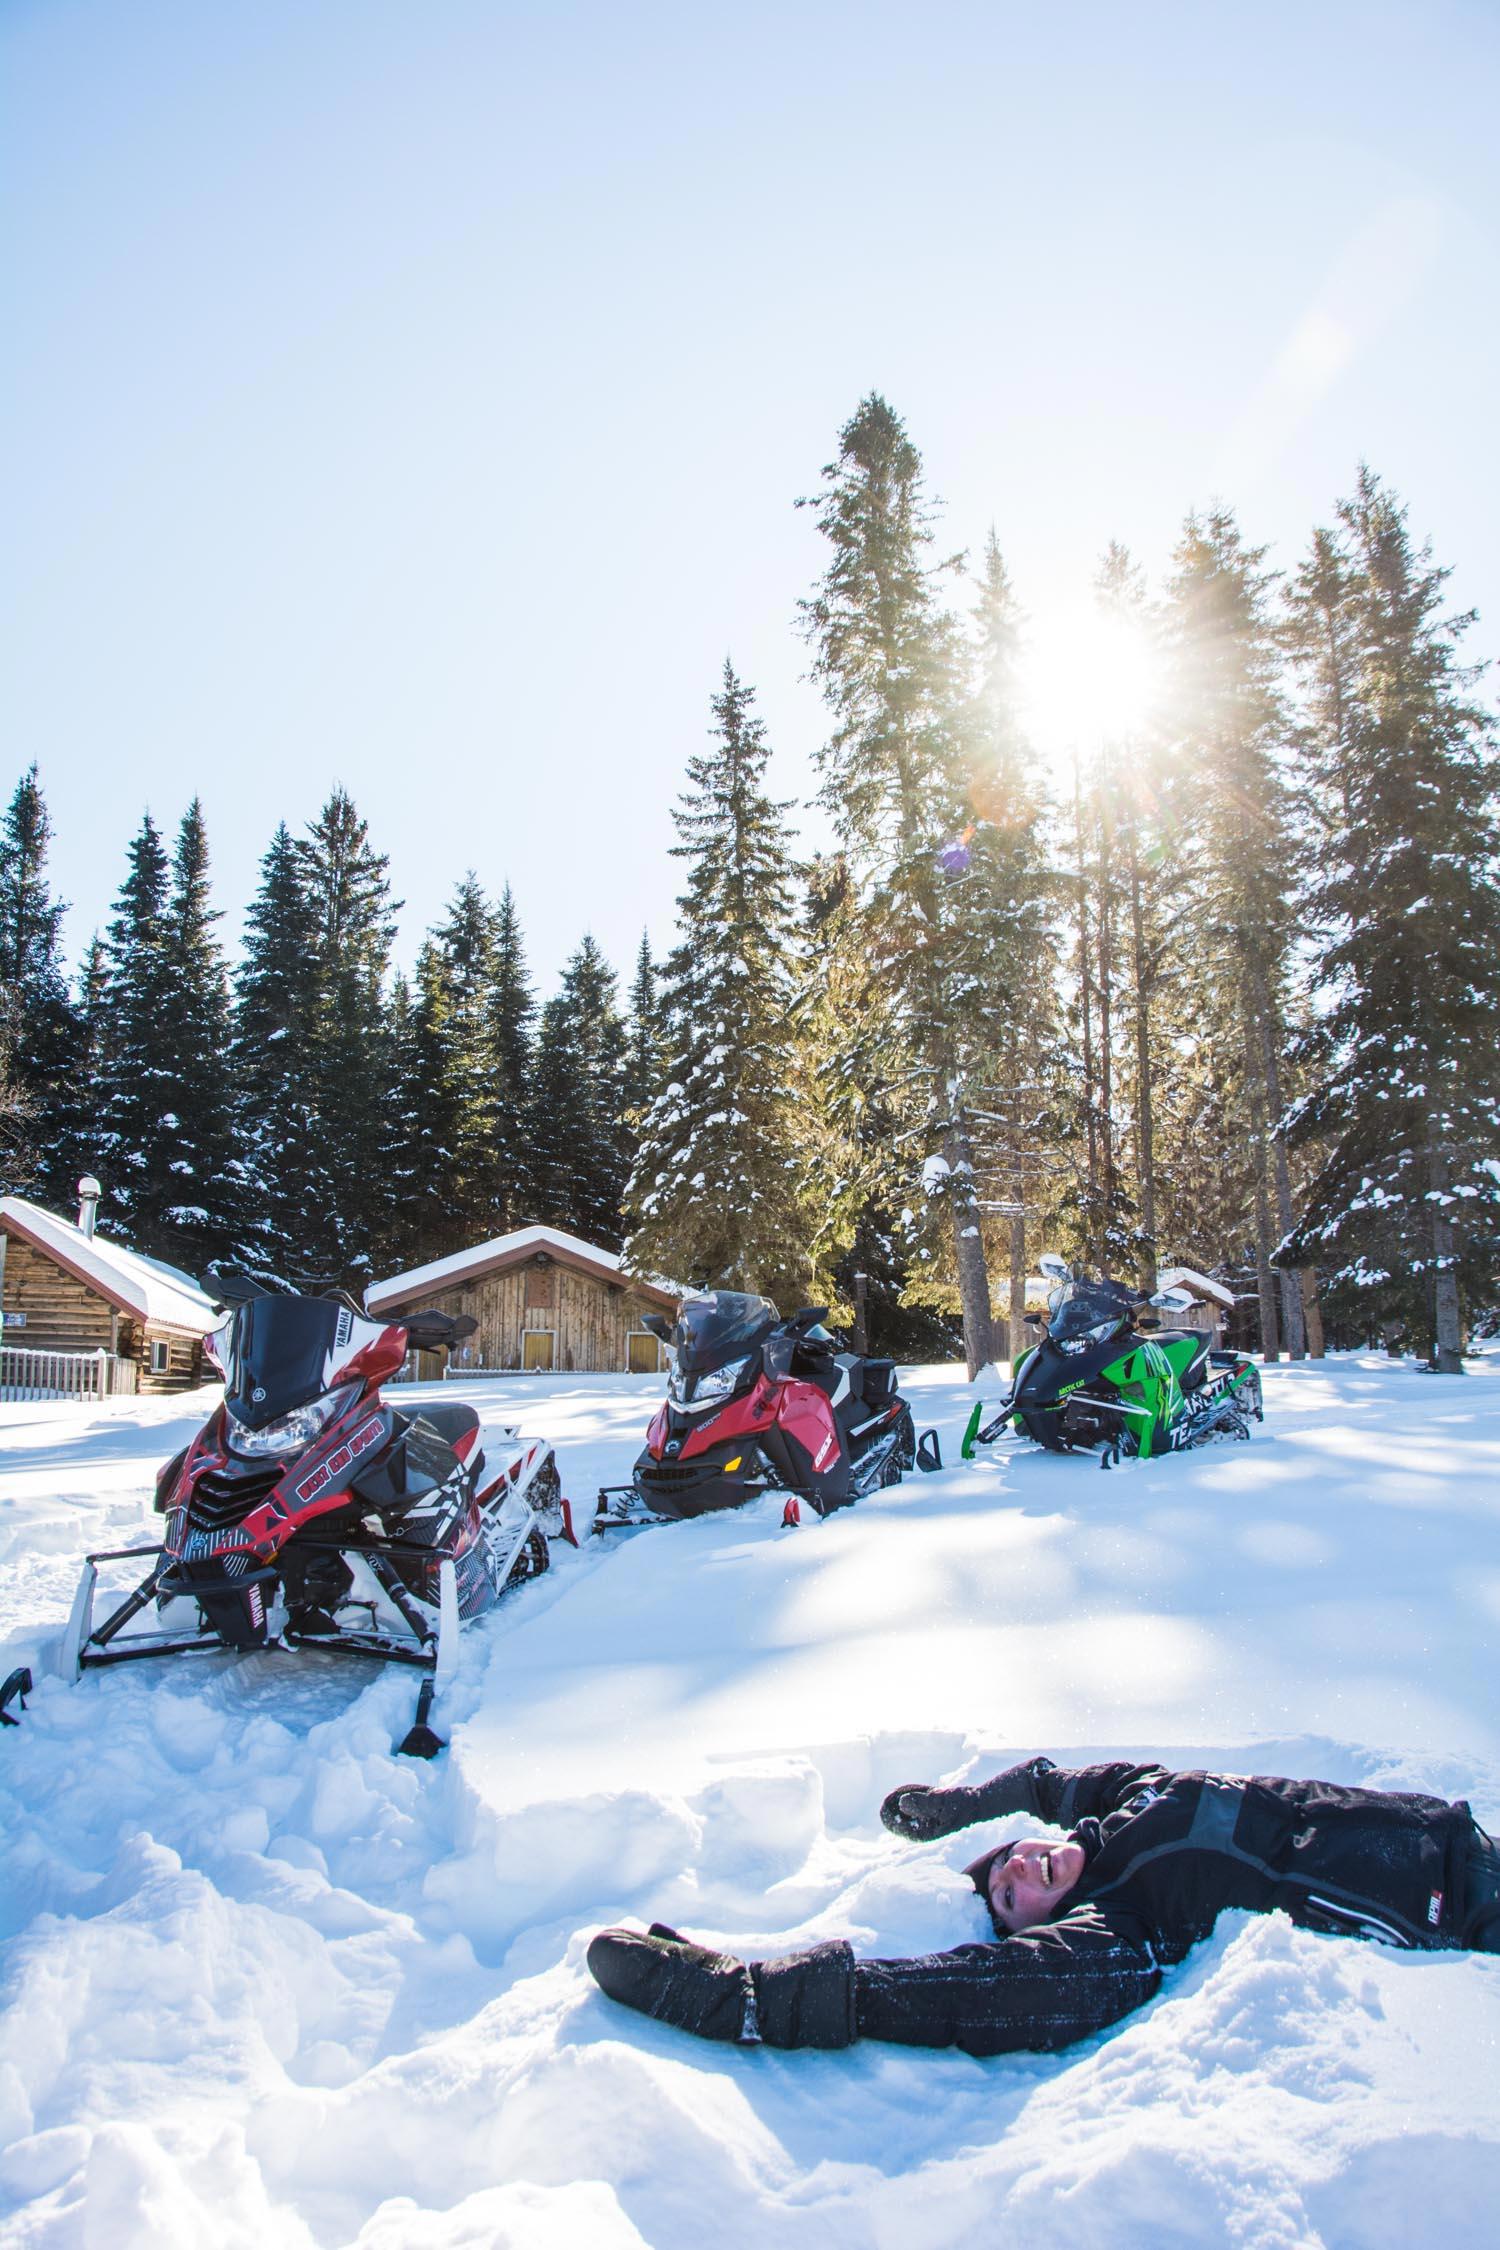 feb10-11 2015-Tourism New Brunswick-T4G Kick-winter 2015-New Brunswick Great Northern Odyssey-snowmobile trip-Mount Carleton-NB-photo by Aaron McKenzie Fraser-www.amfraser.com-_AMF4372.jpg